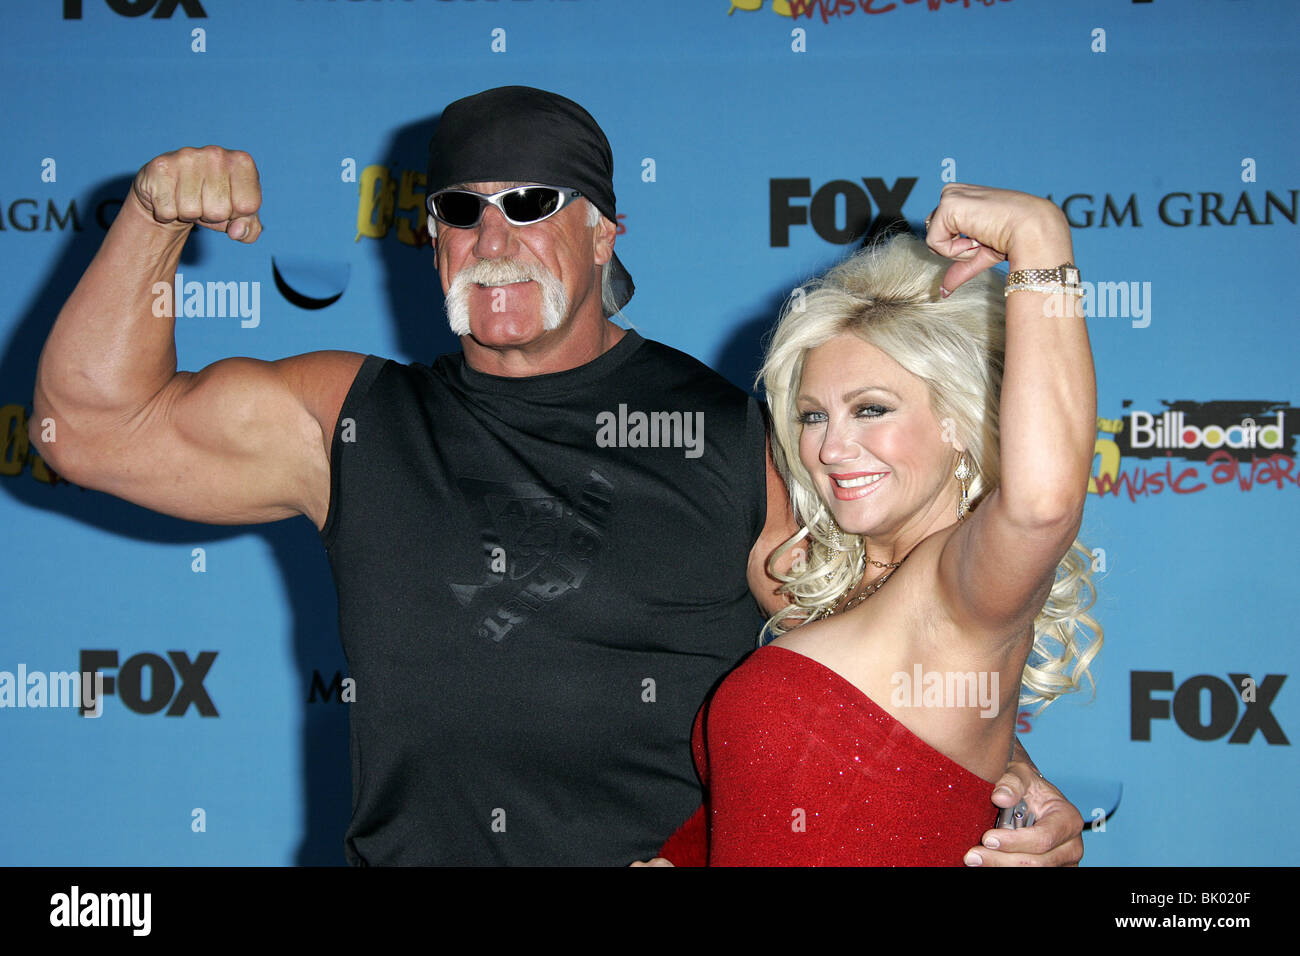 نتيجة بحث الصور عن Hulk Hogan Celebs Who Dated EXACT COPIES Of Their Famous Exes